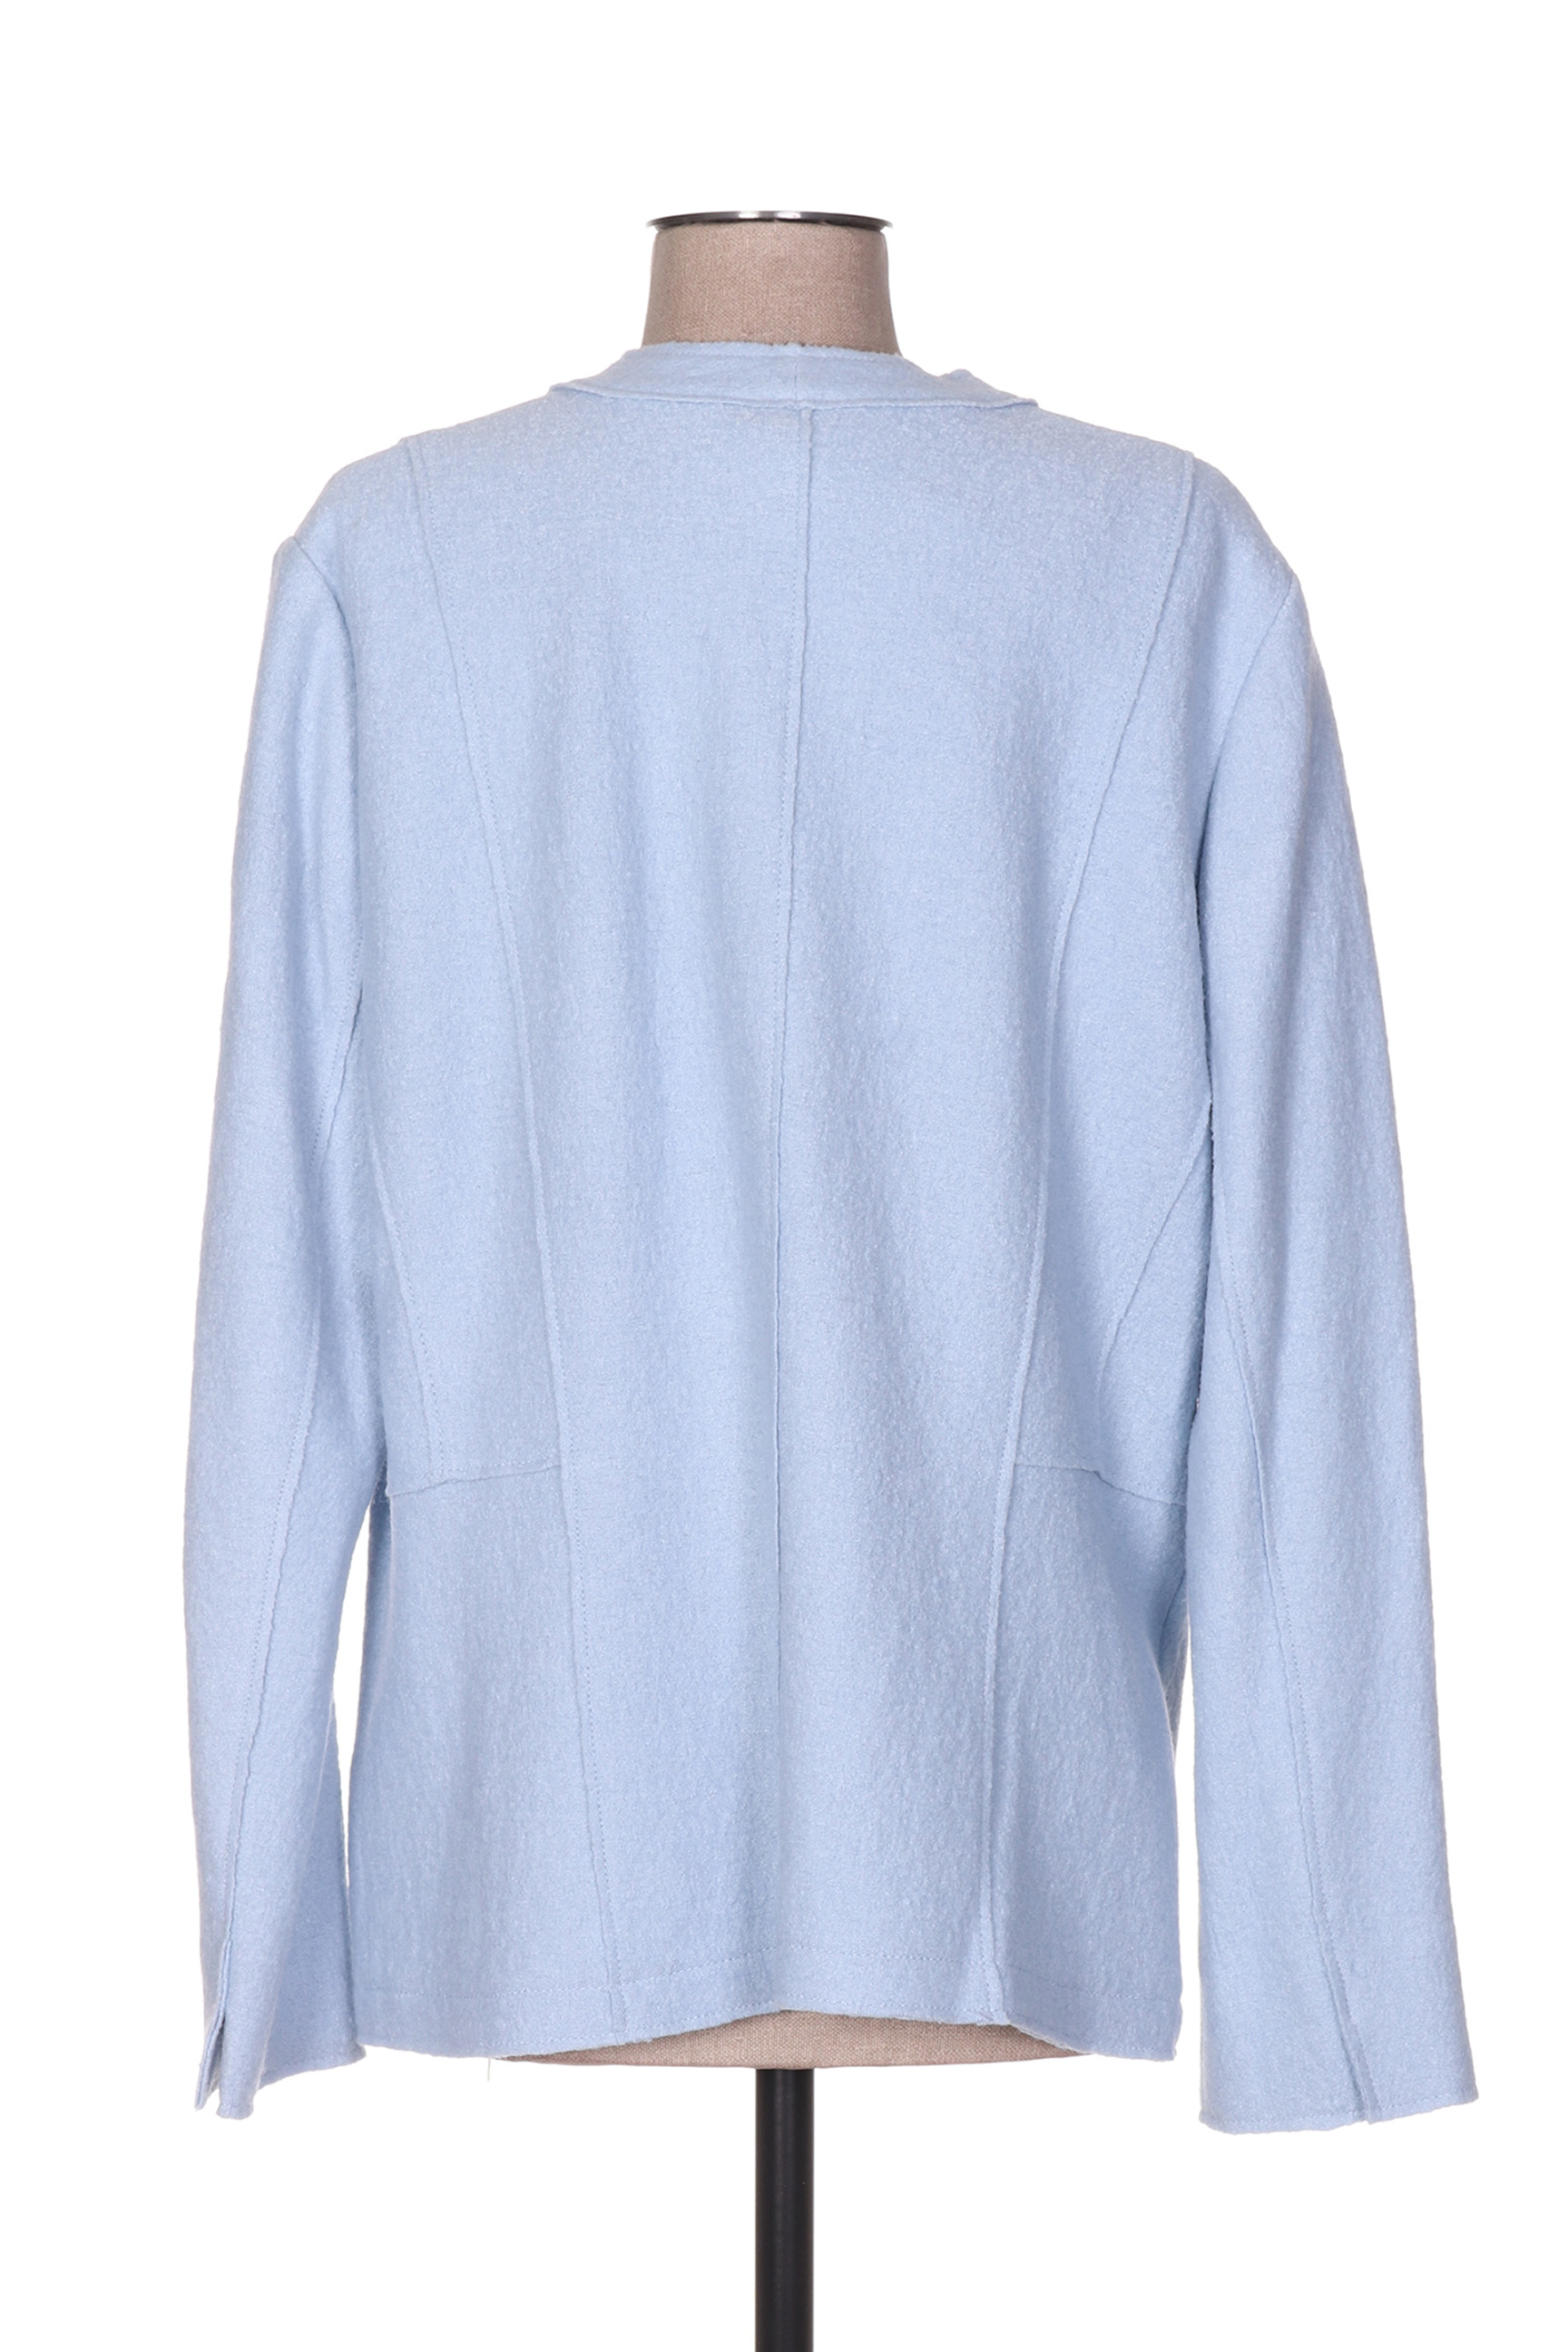 Gerry Weber Vestecasual Femme De Couleur Bleu En Soldes Pas Cher 1215766-bleu00